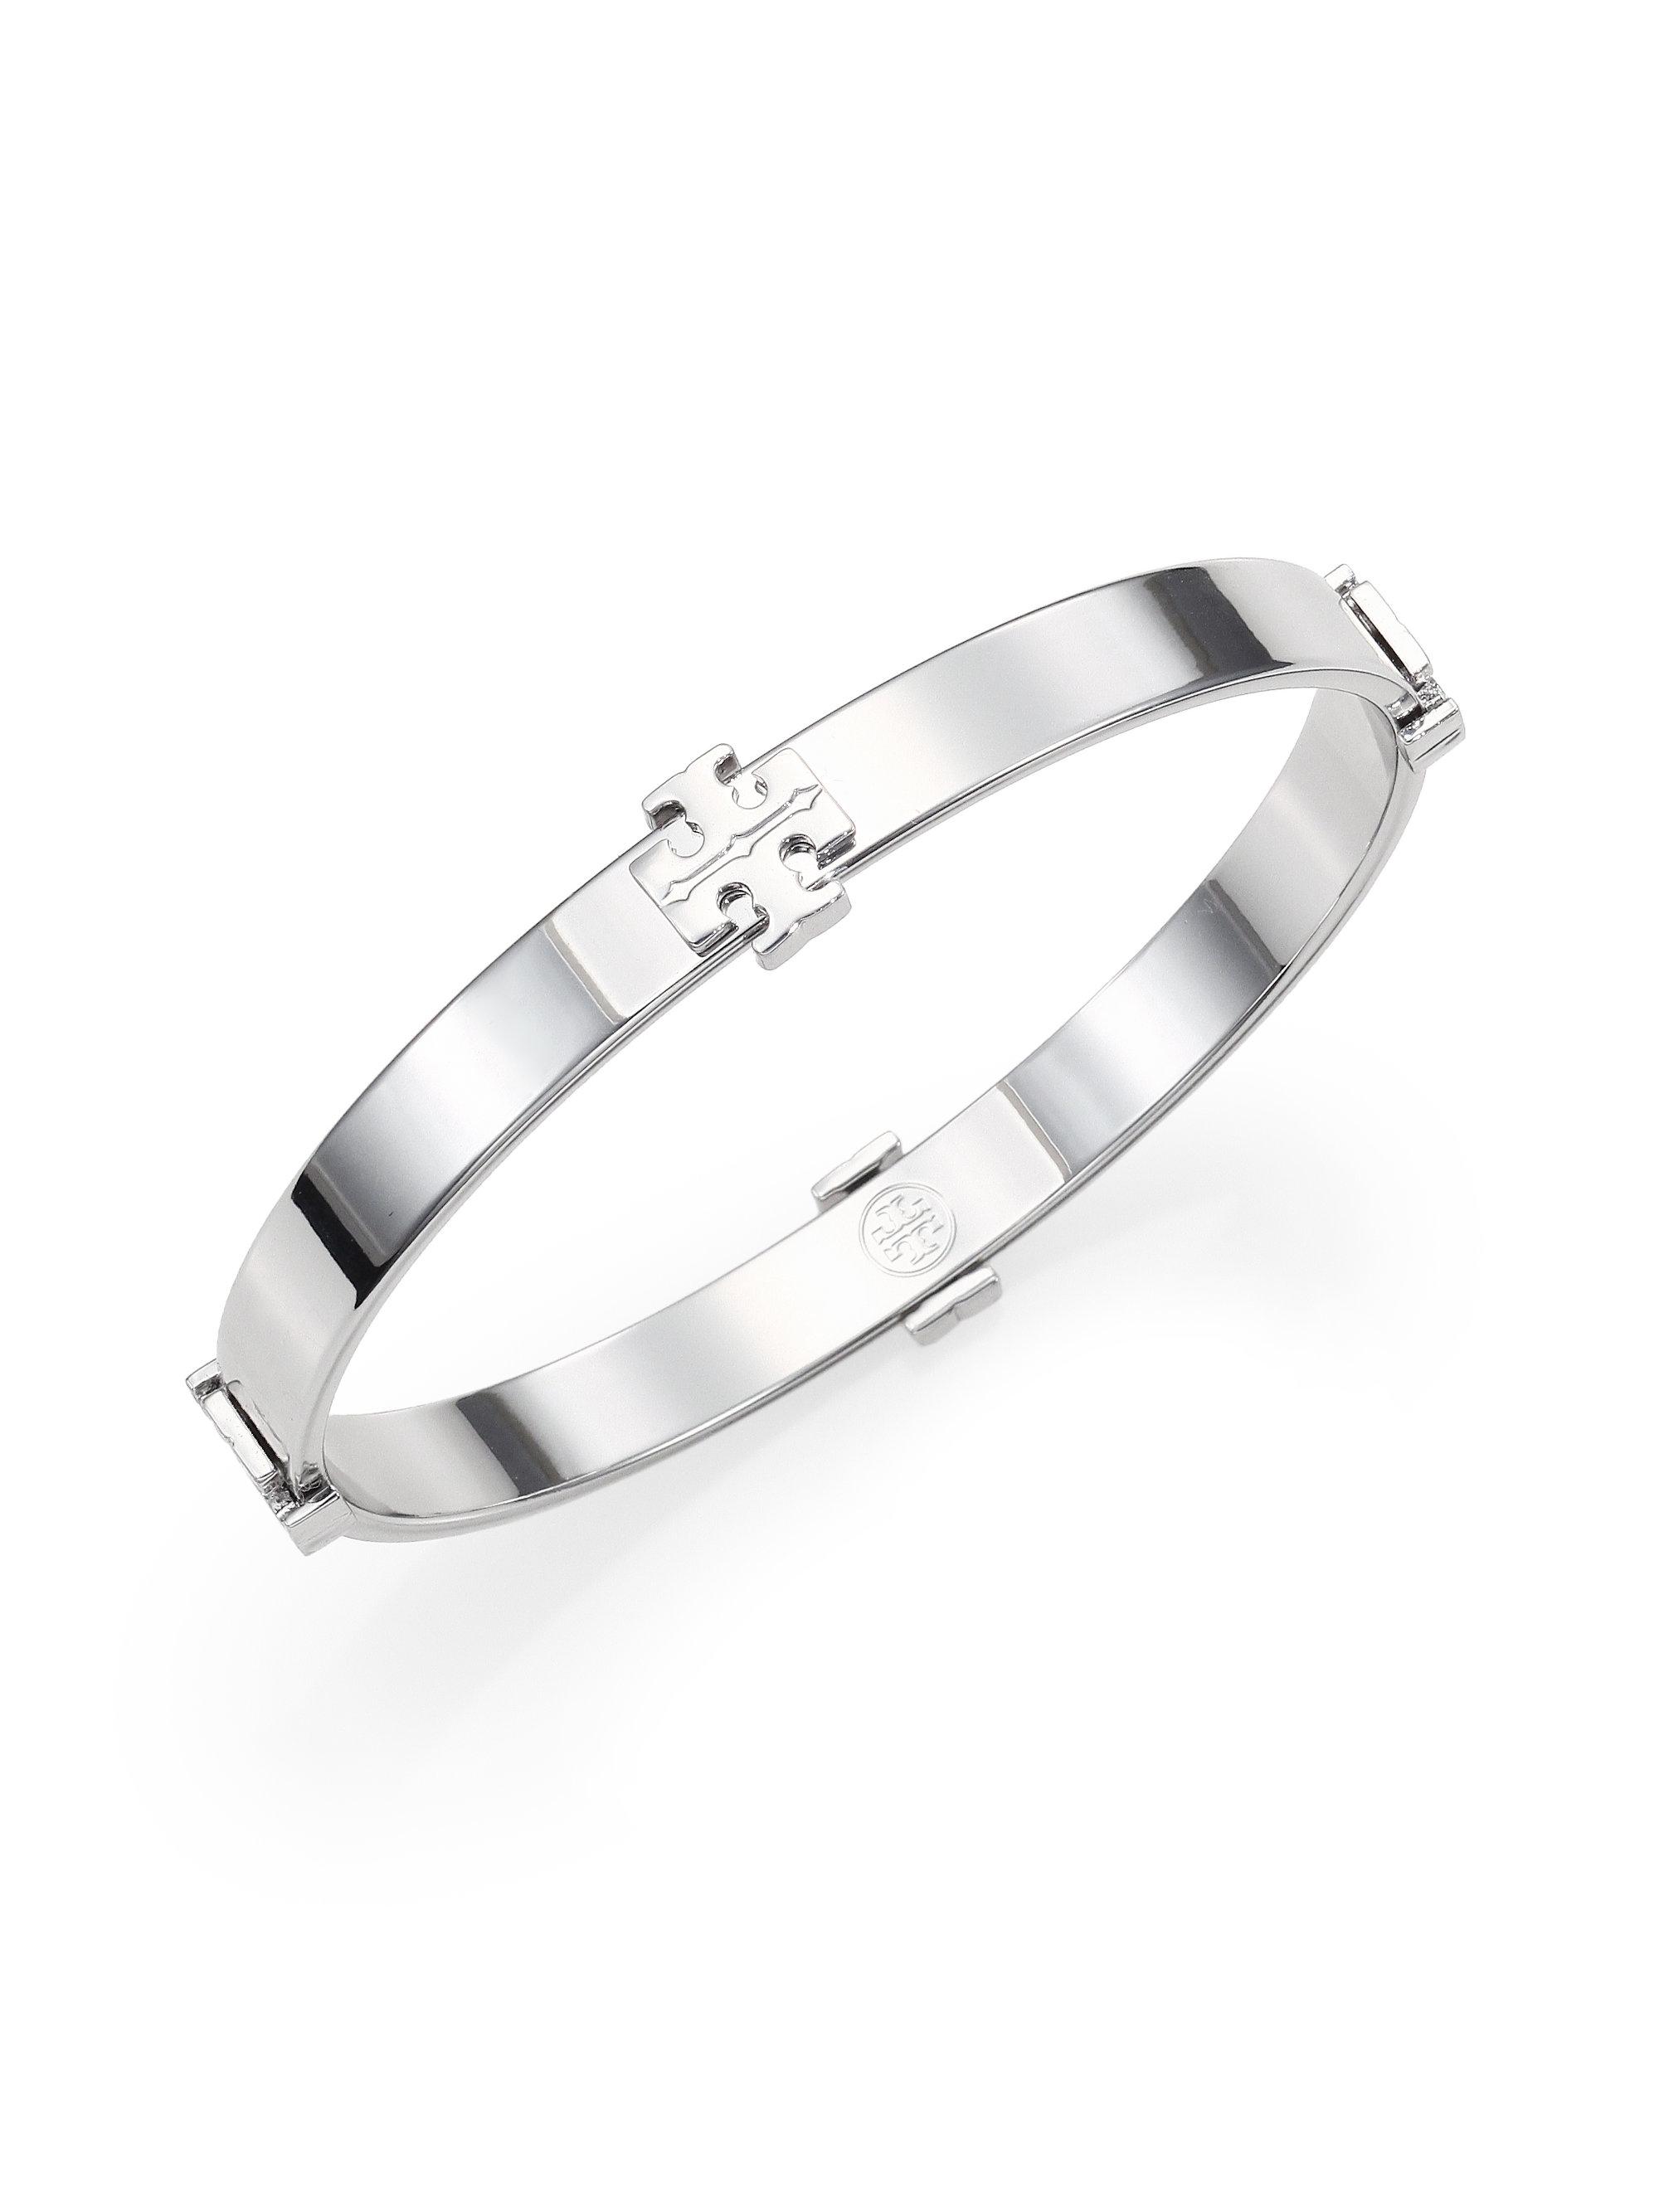 lyst tory burch logo station bangle bracelet silvertone in metallic. Black Bedroom Furniture Sets. Home Design Ideas